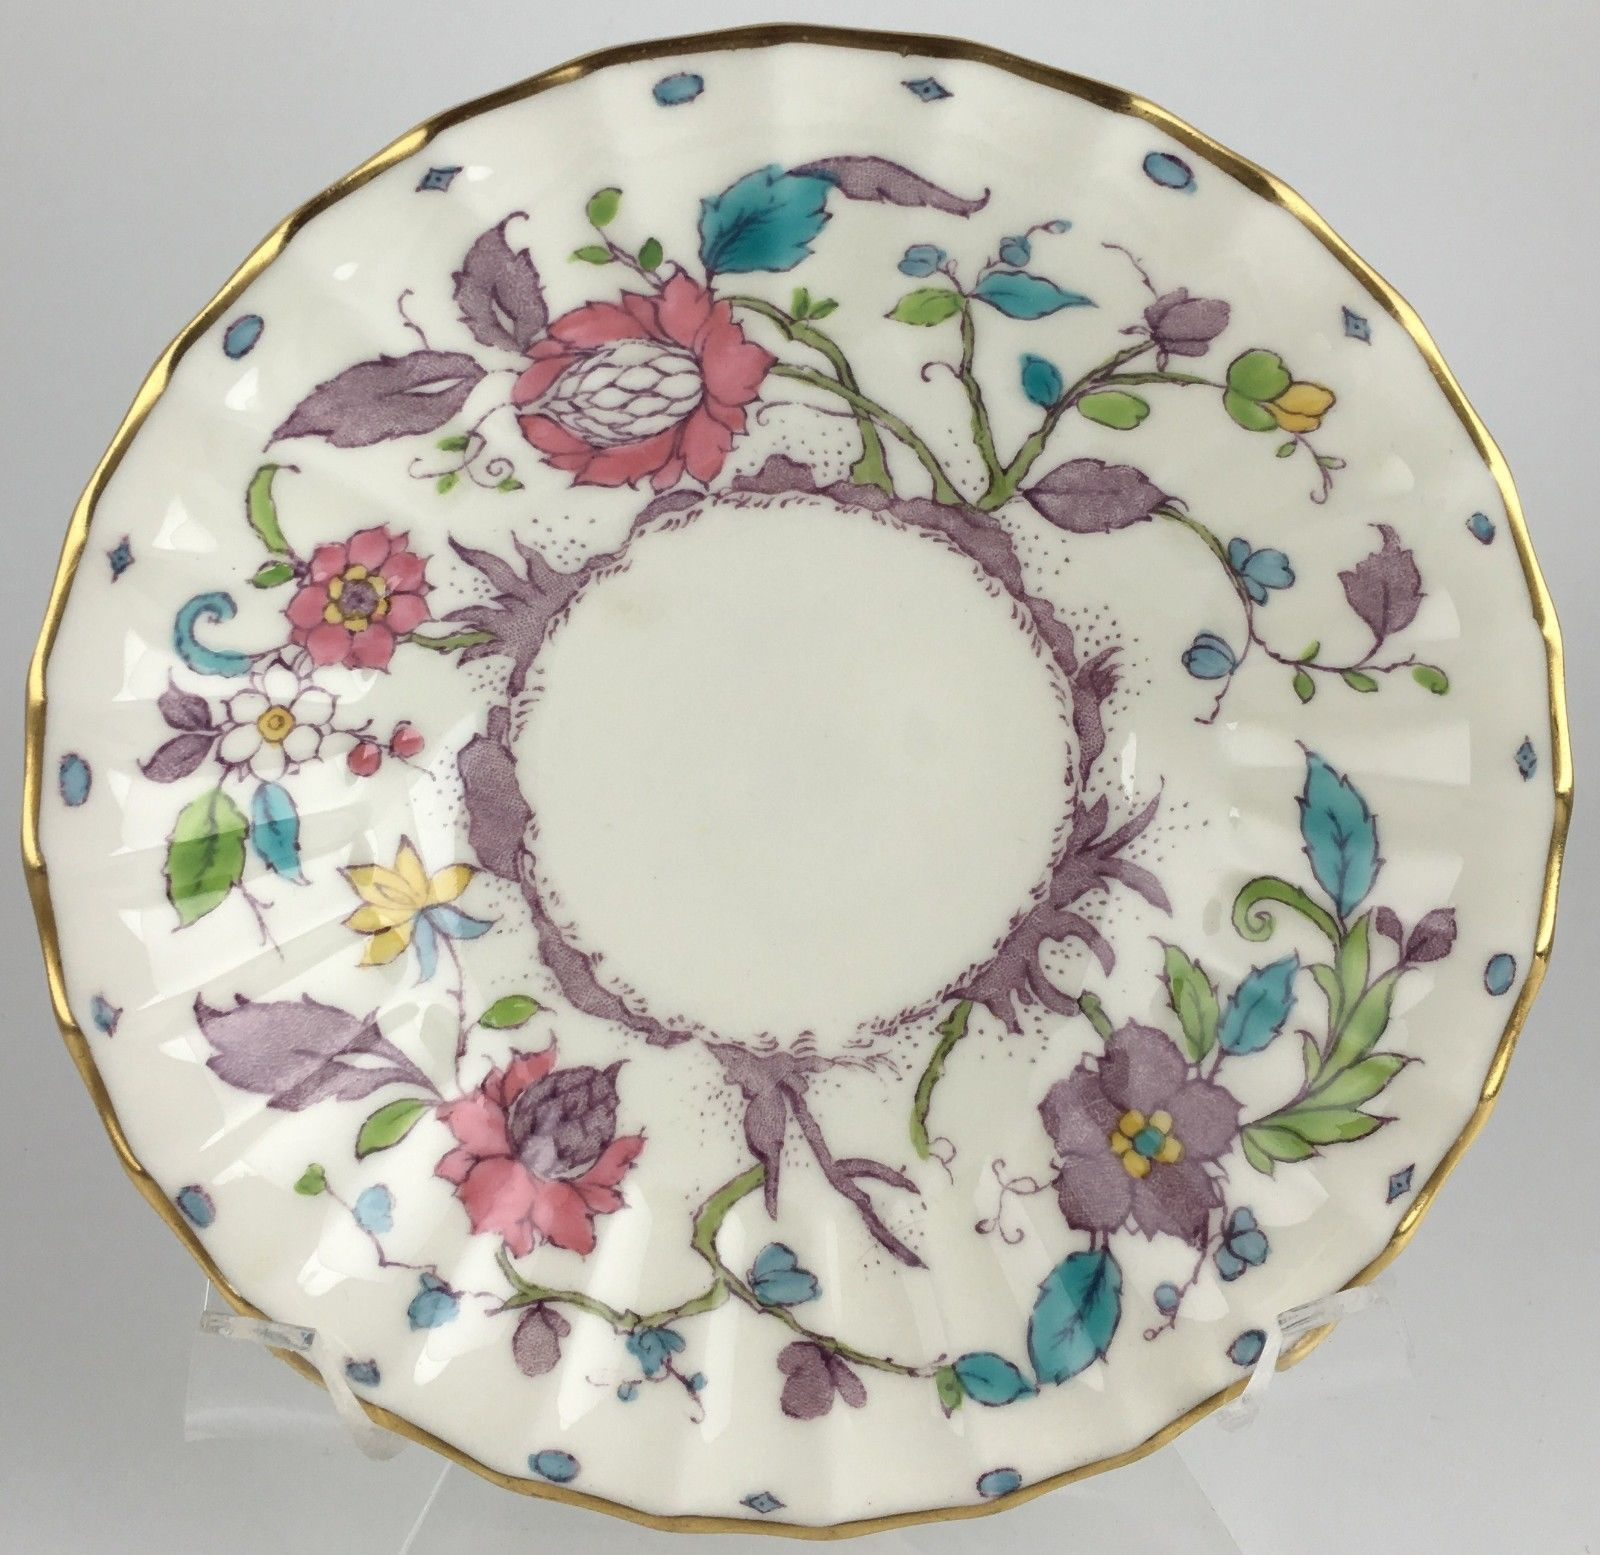 Royal Worcester KASHMIR fruit bowl (3 available) (SKU EC 03/03) FREE SHIPPING